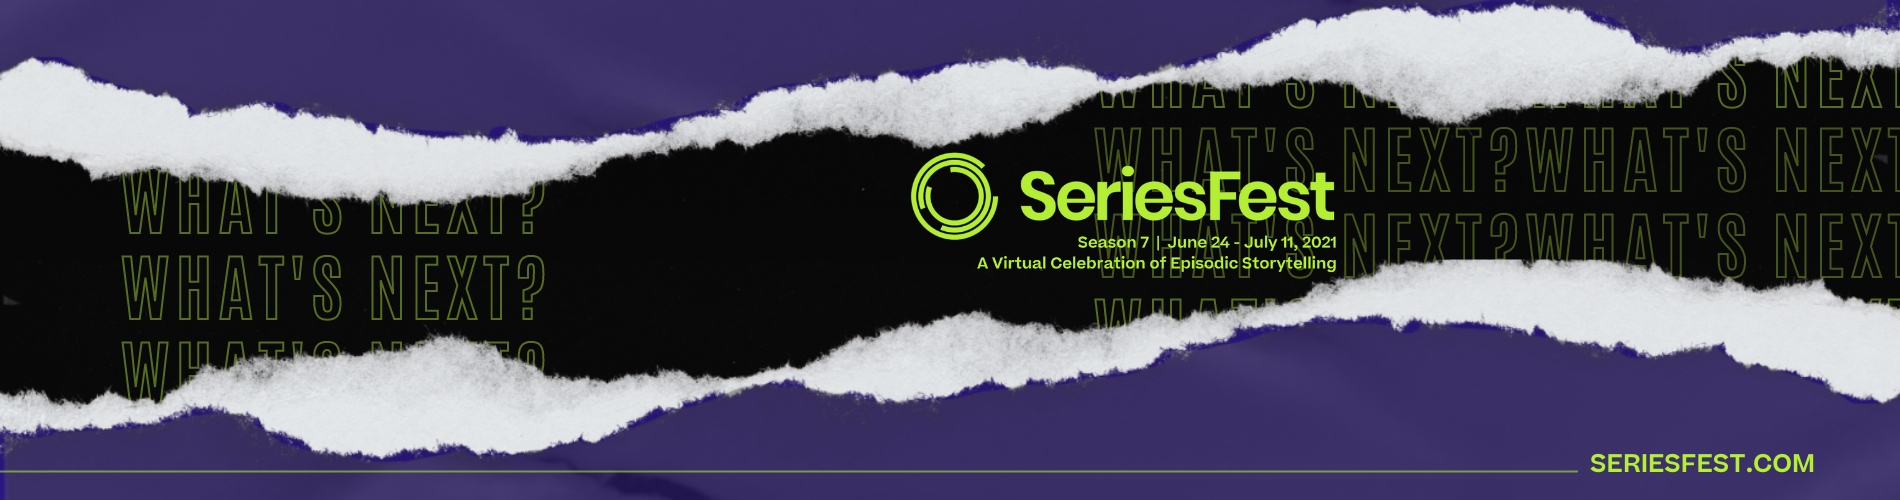 SeriesFest: Season 7